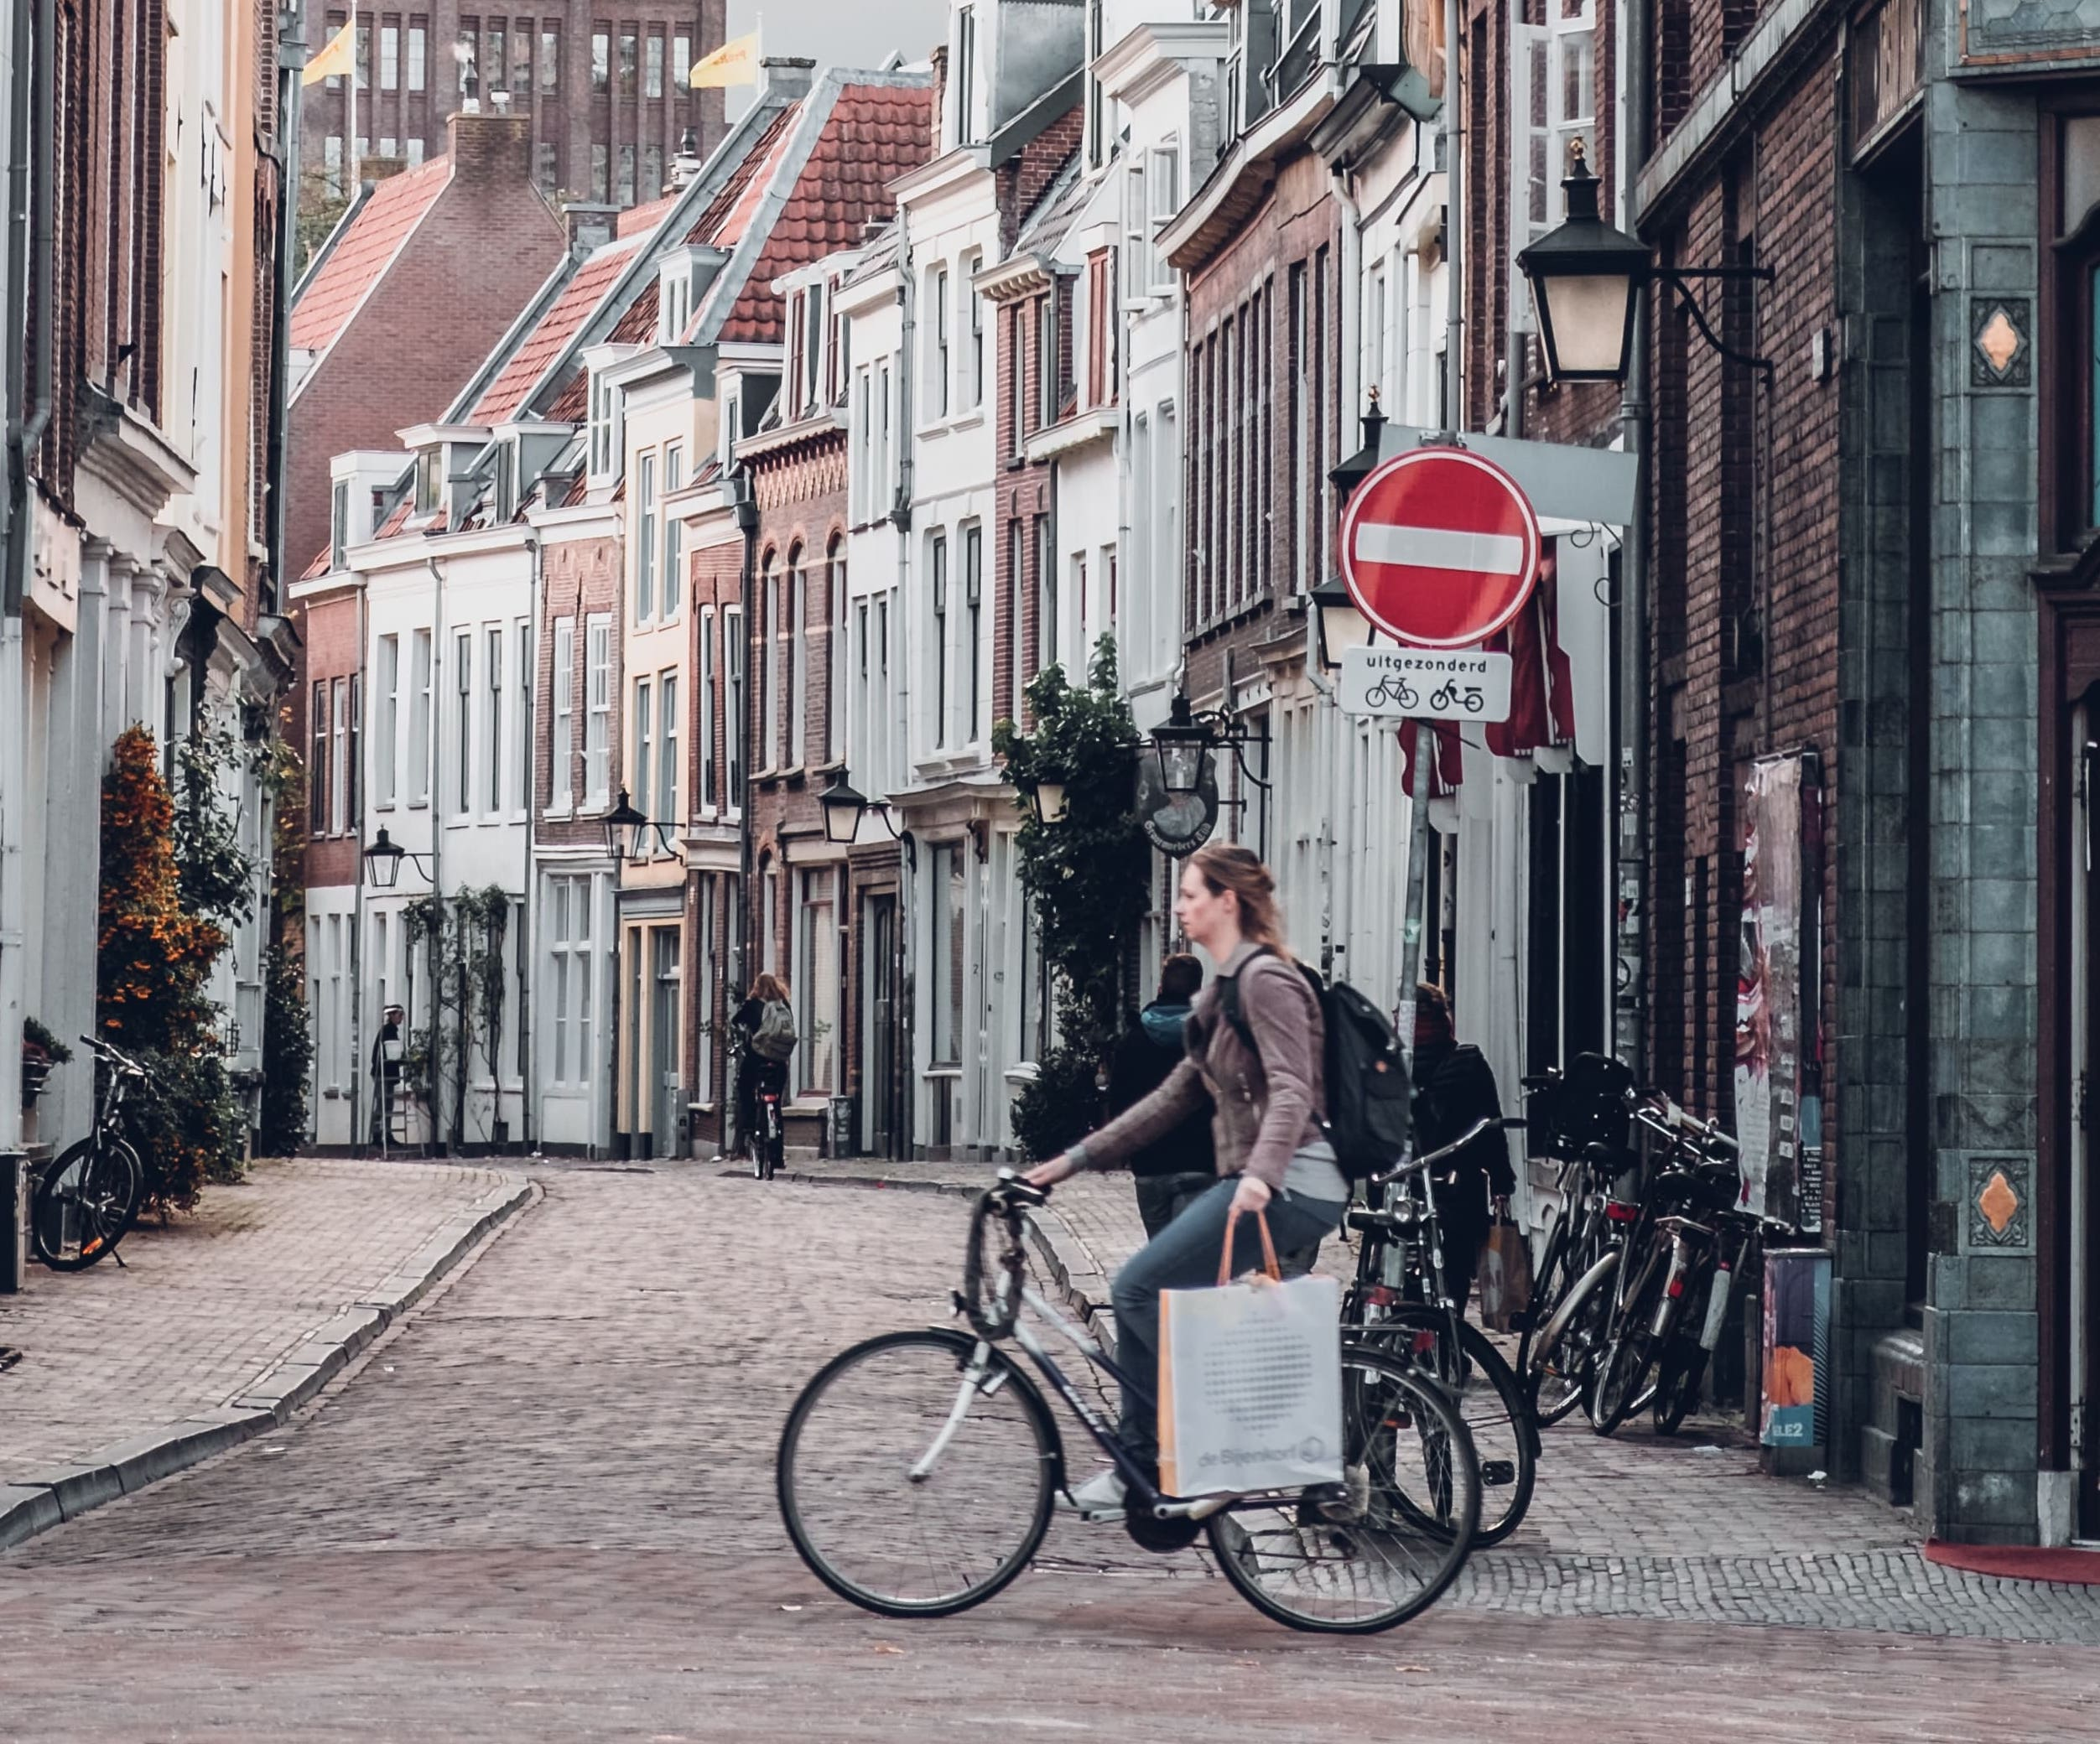 Biking culture in the Netherlands